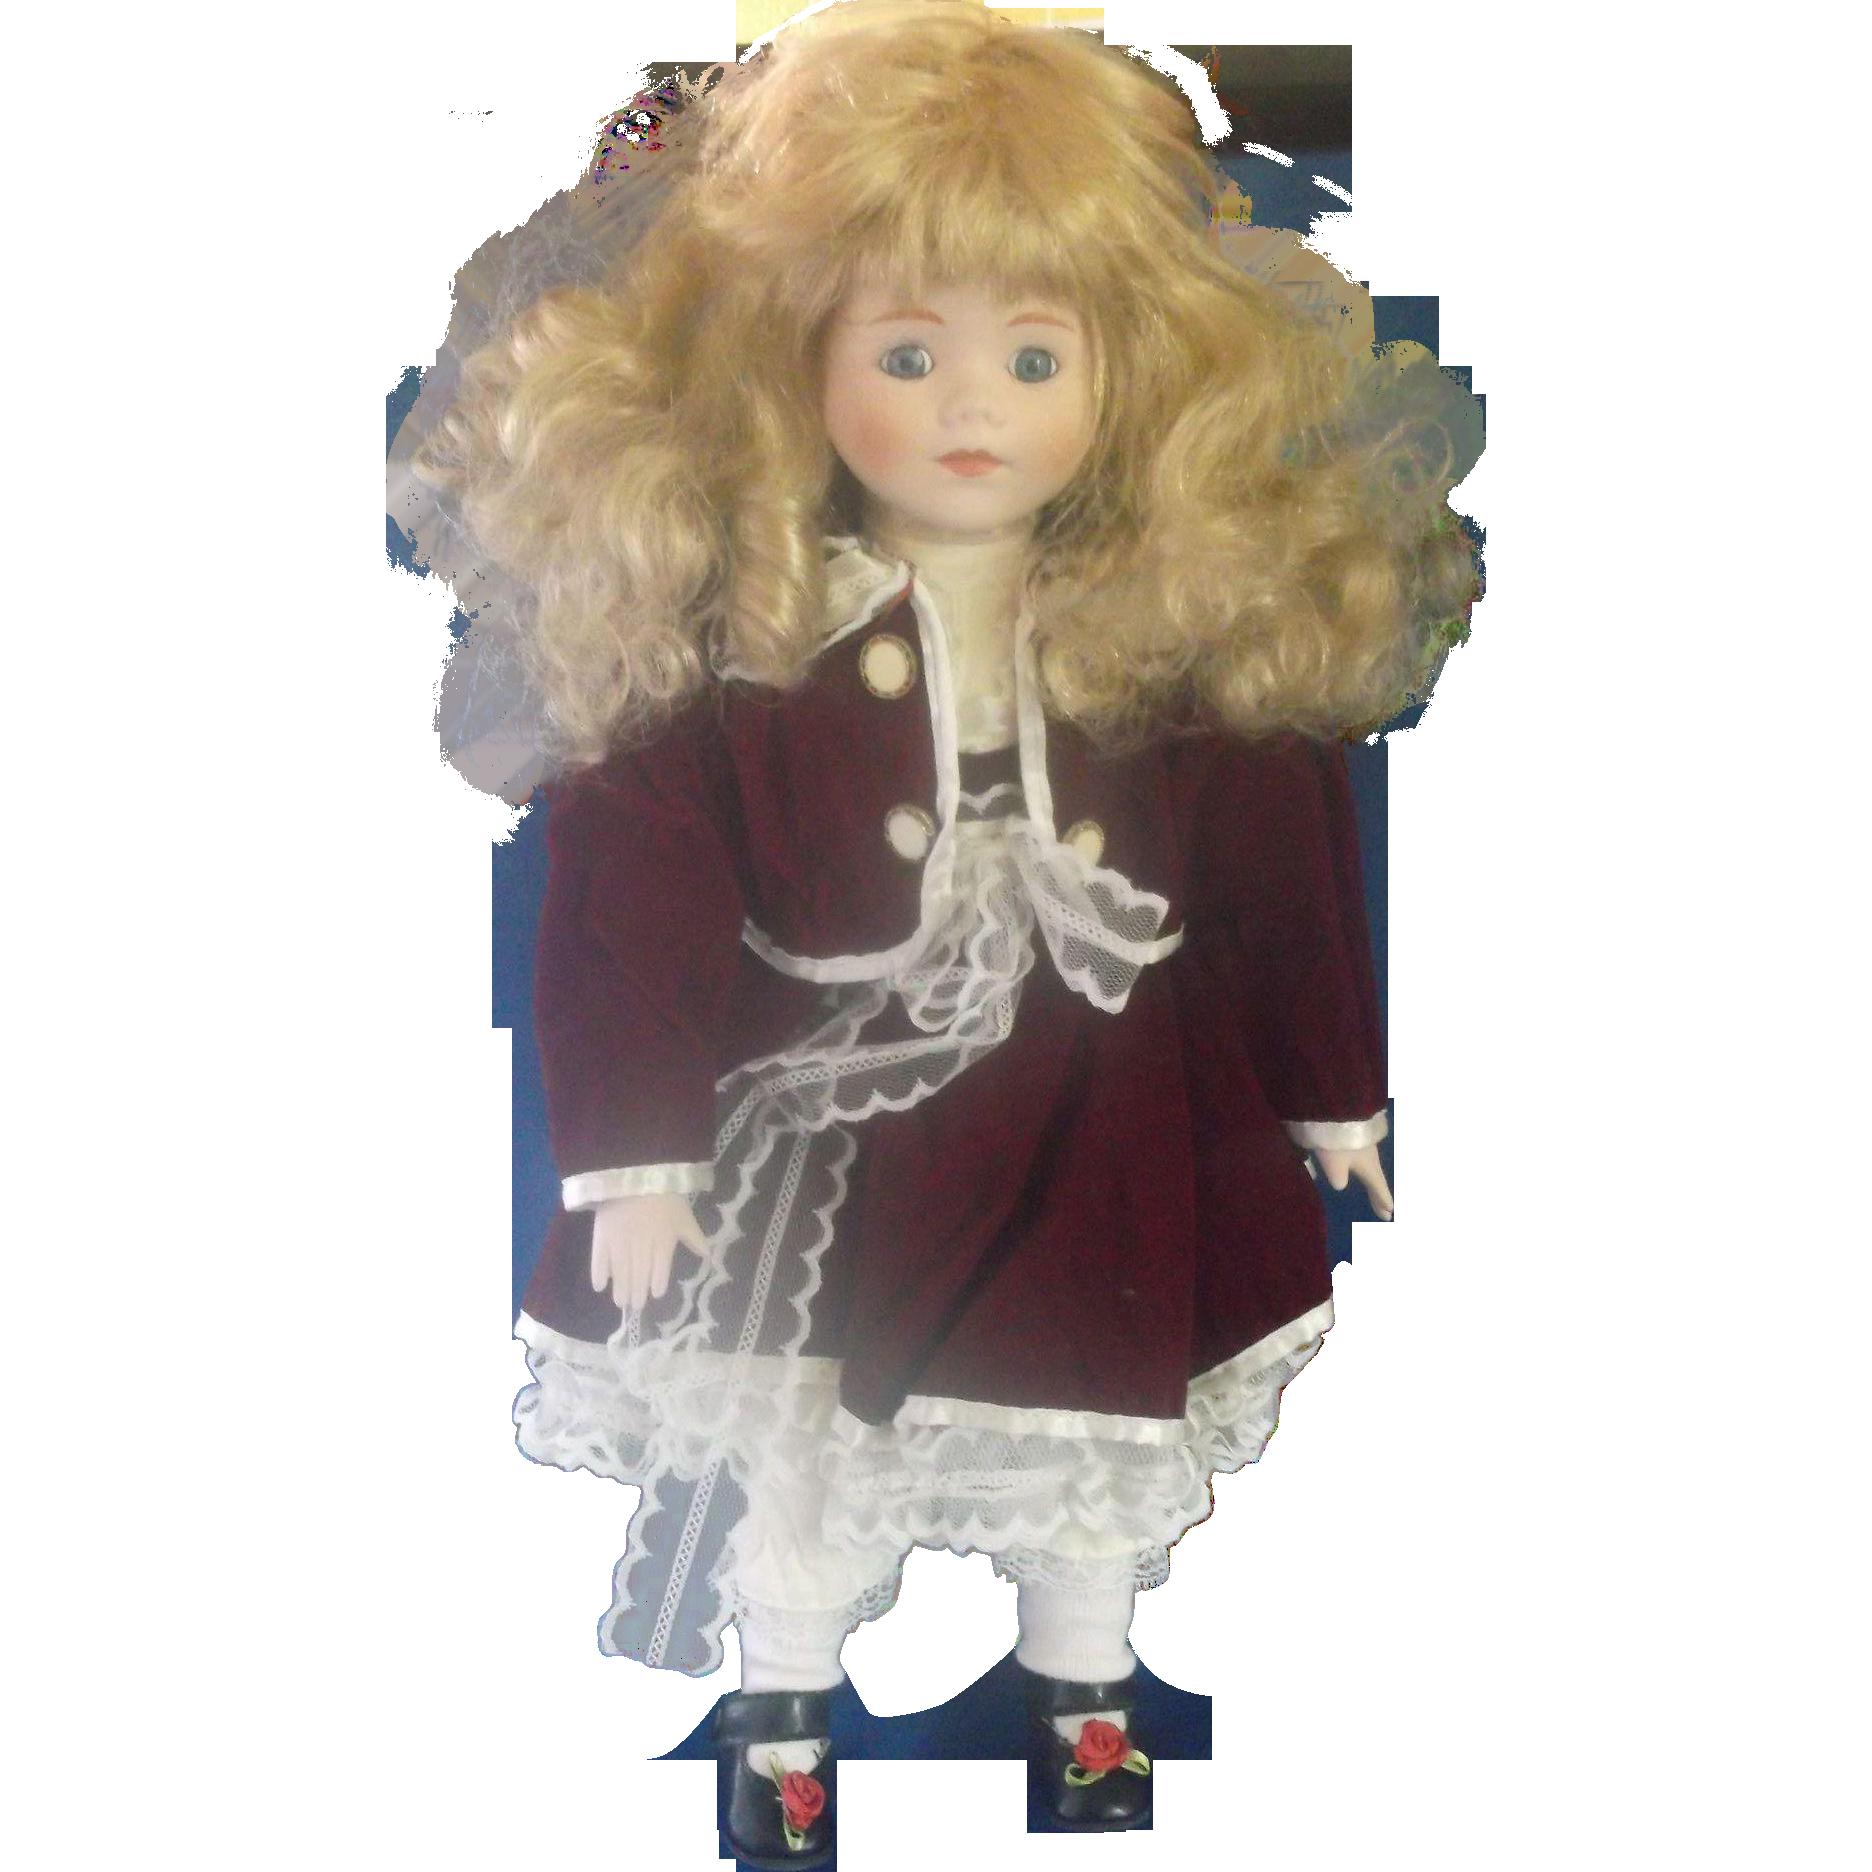 Brinn's Megan Doll 1988 1989 Red Velvet Dress Blonde Hair Blue Eyes Made in Taiwan 989/12,500